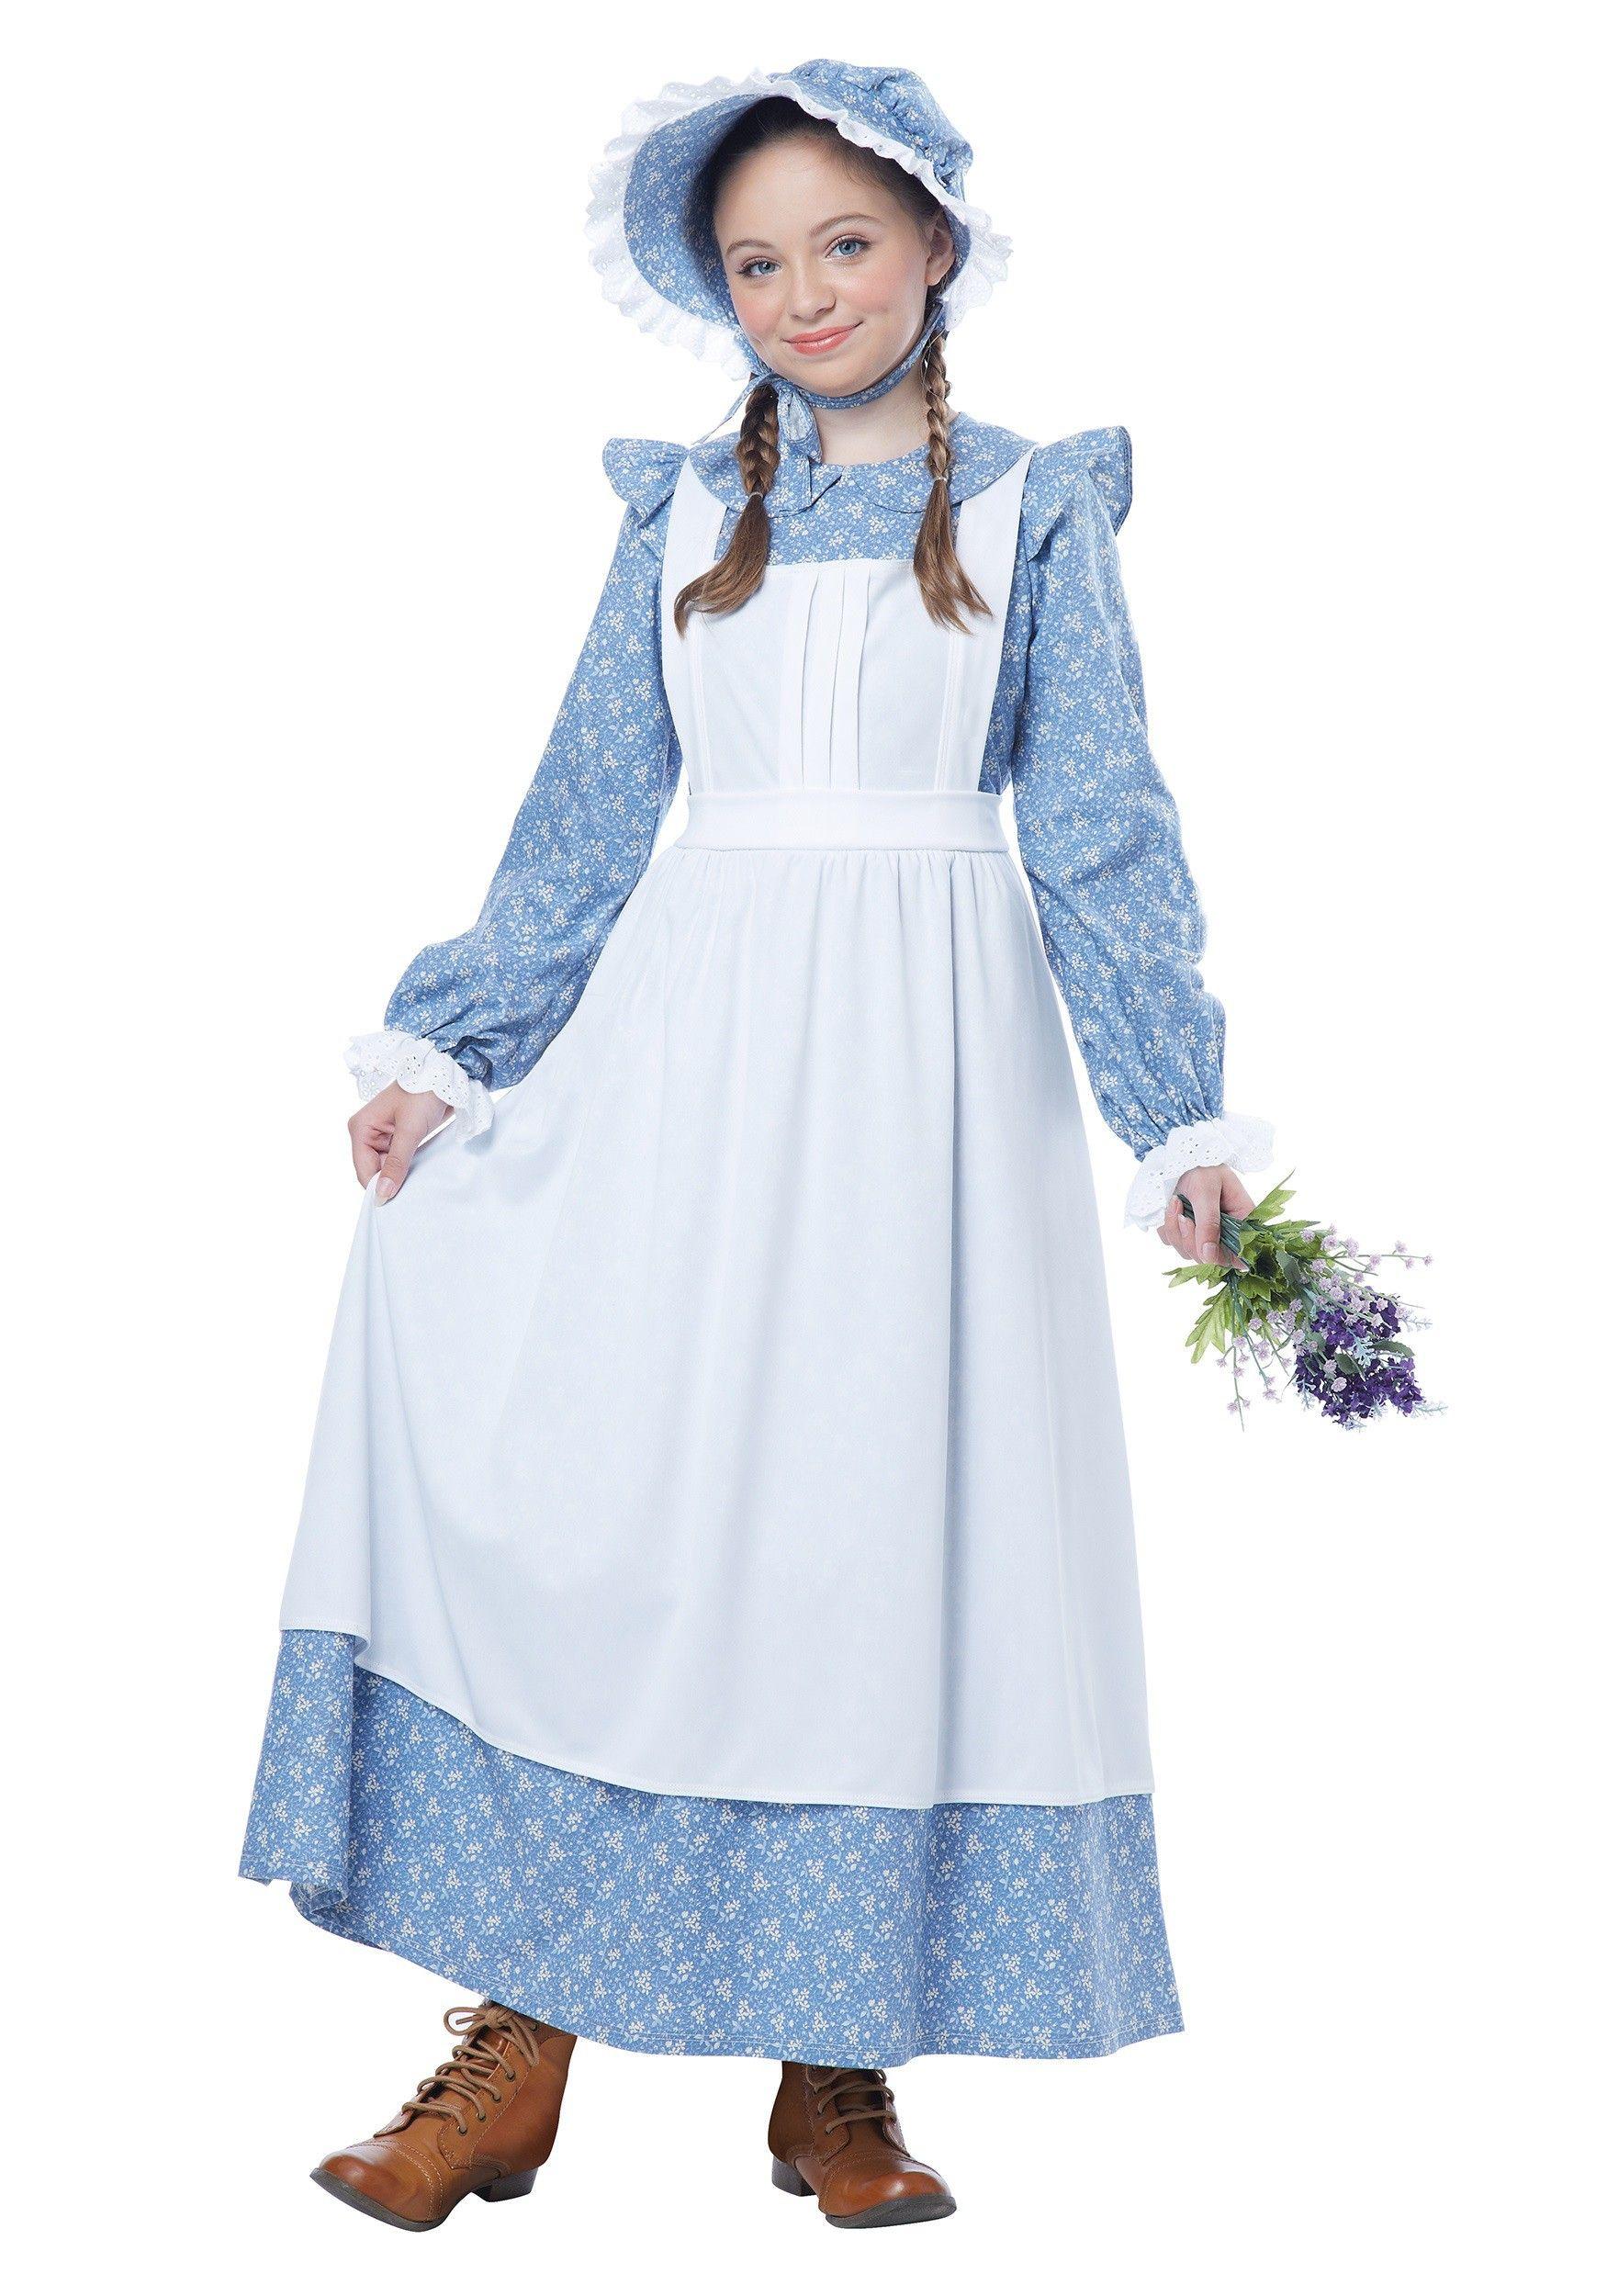 Child pioneer girl costume girls halloween costumes pinterest pioneer girl costumes and - Costume halloween fille ...